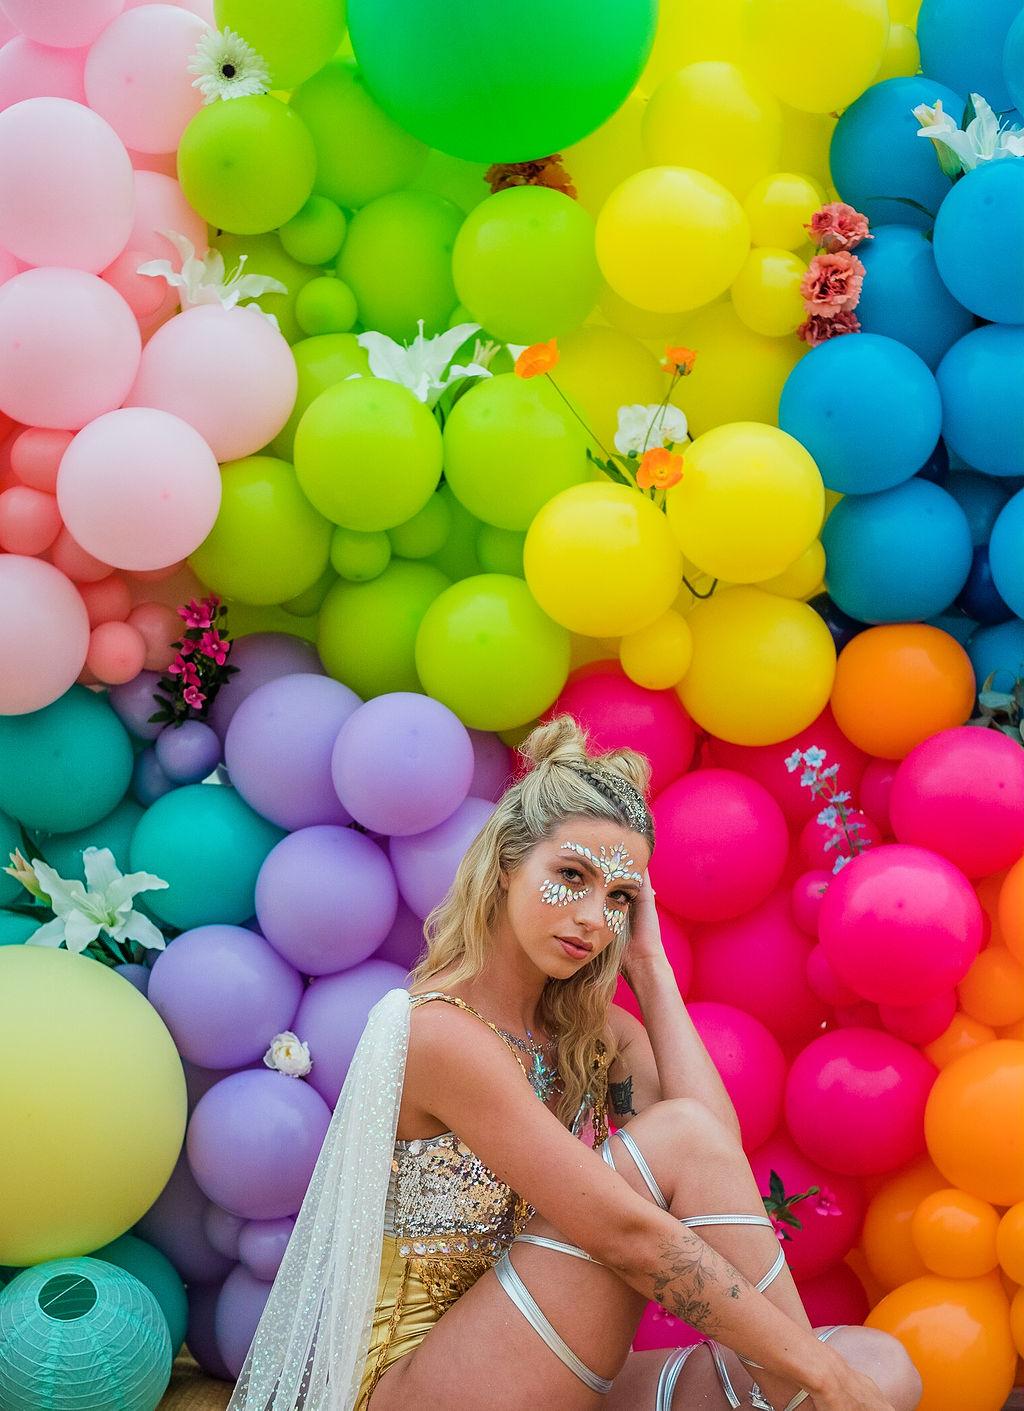 sparkly festival wedding - rainbow wedding backdrop - colourful wedding balloons - festival bride - festival wedding wear - unique bridal wear